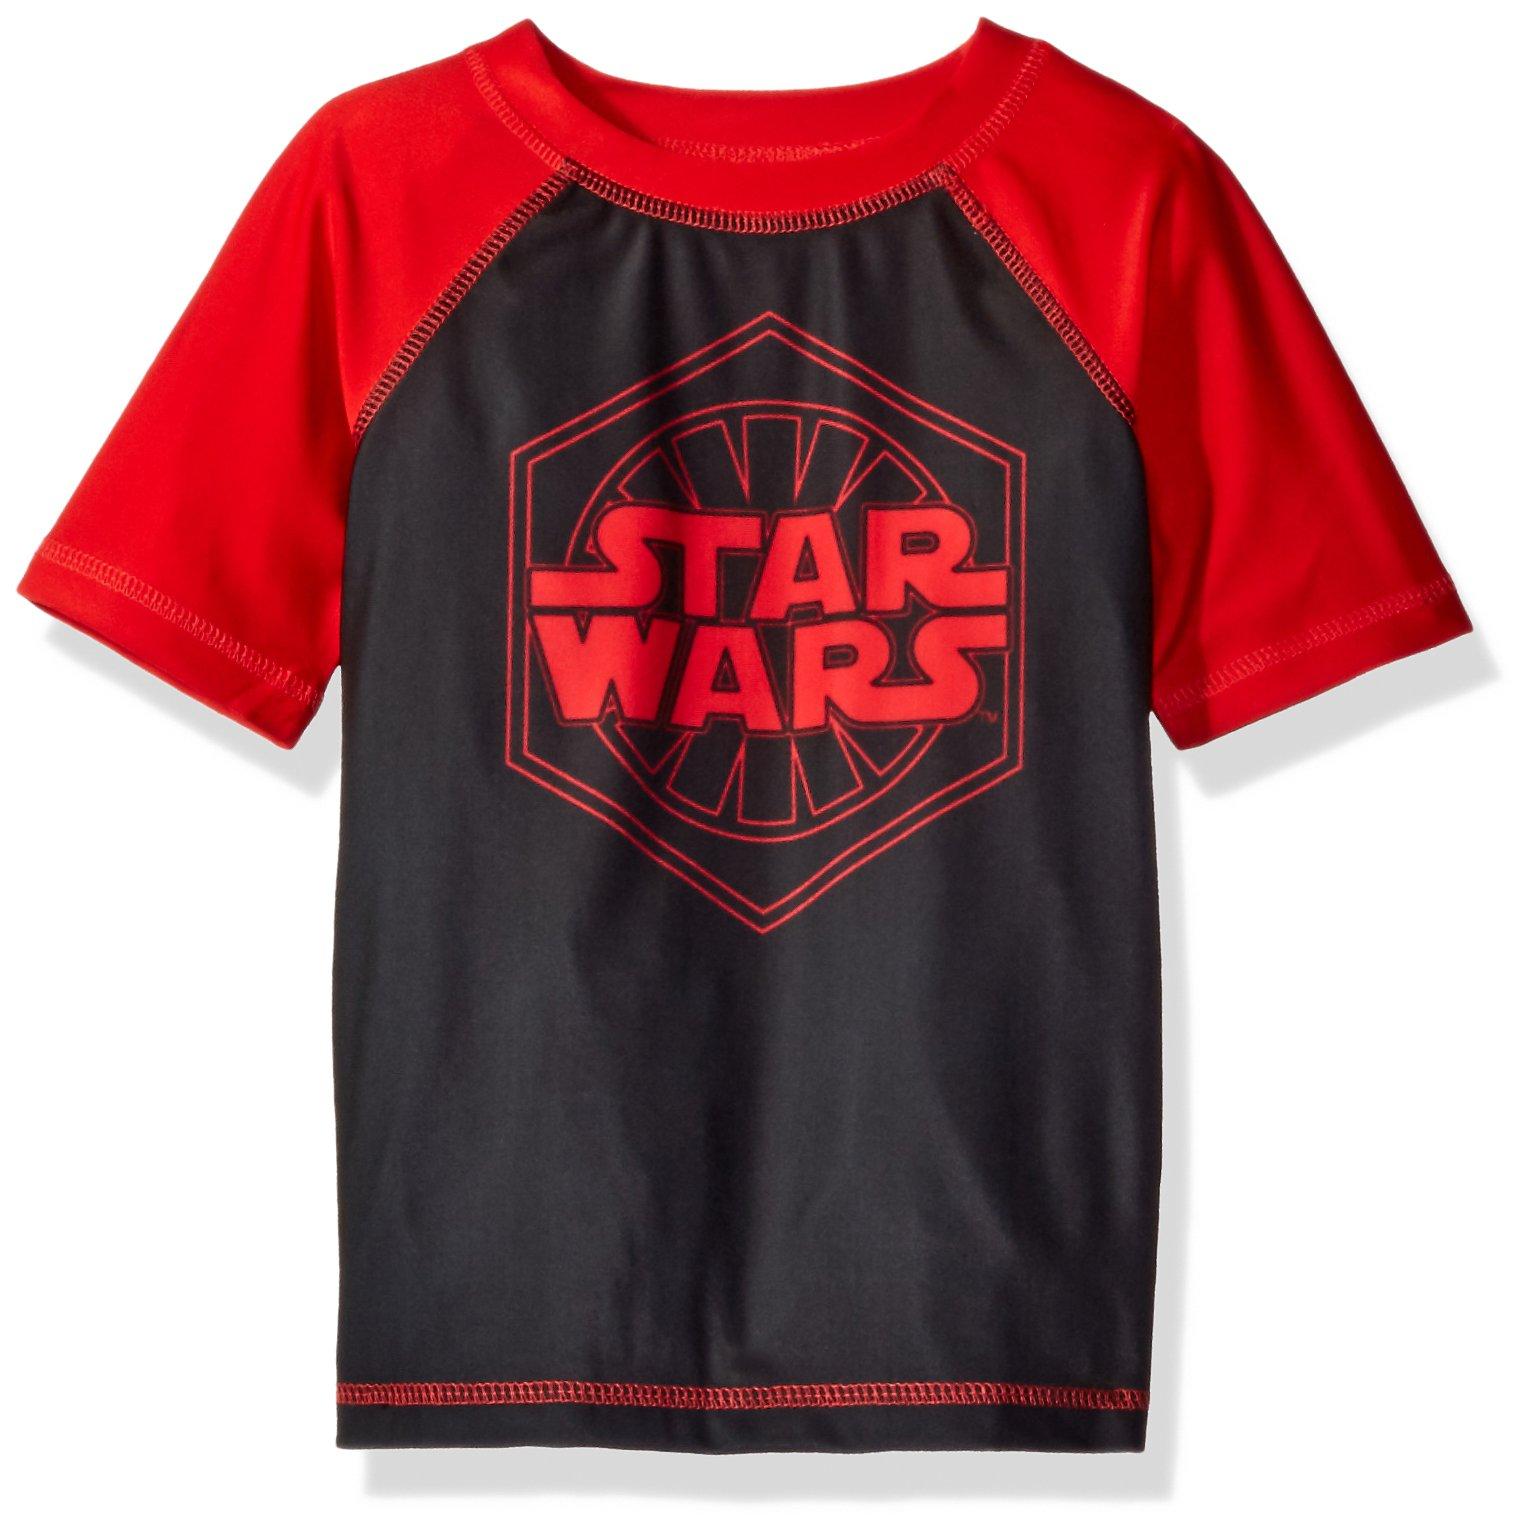 Star Wars Big Boys' Rashguard, Red, 4